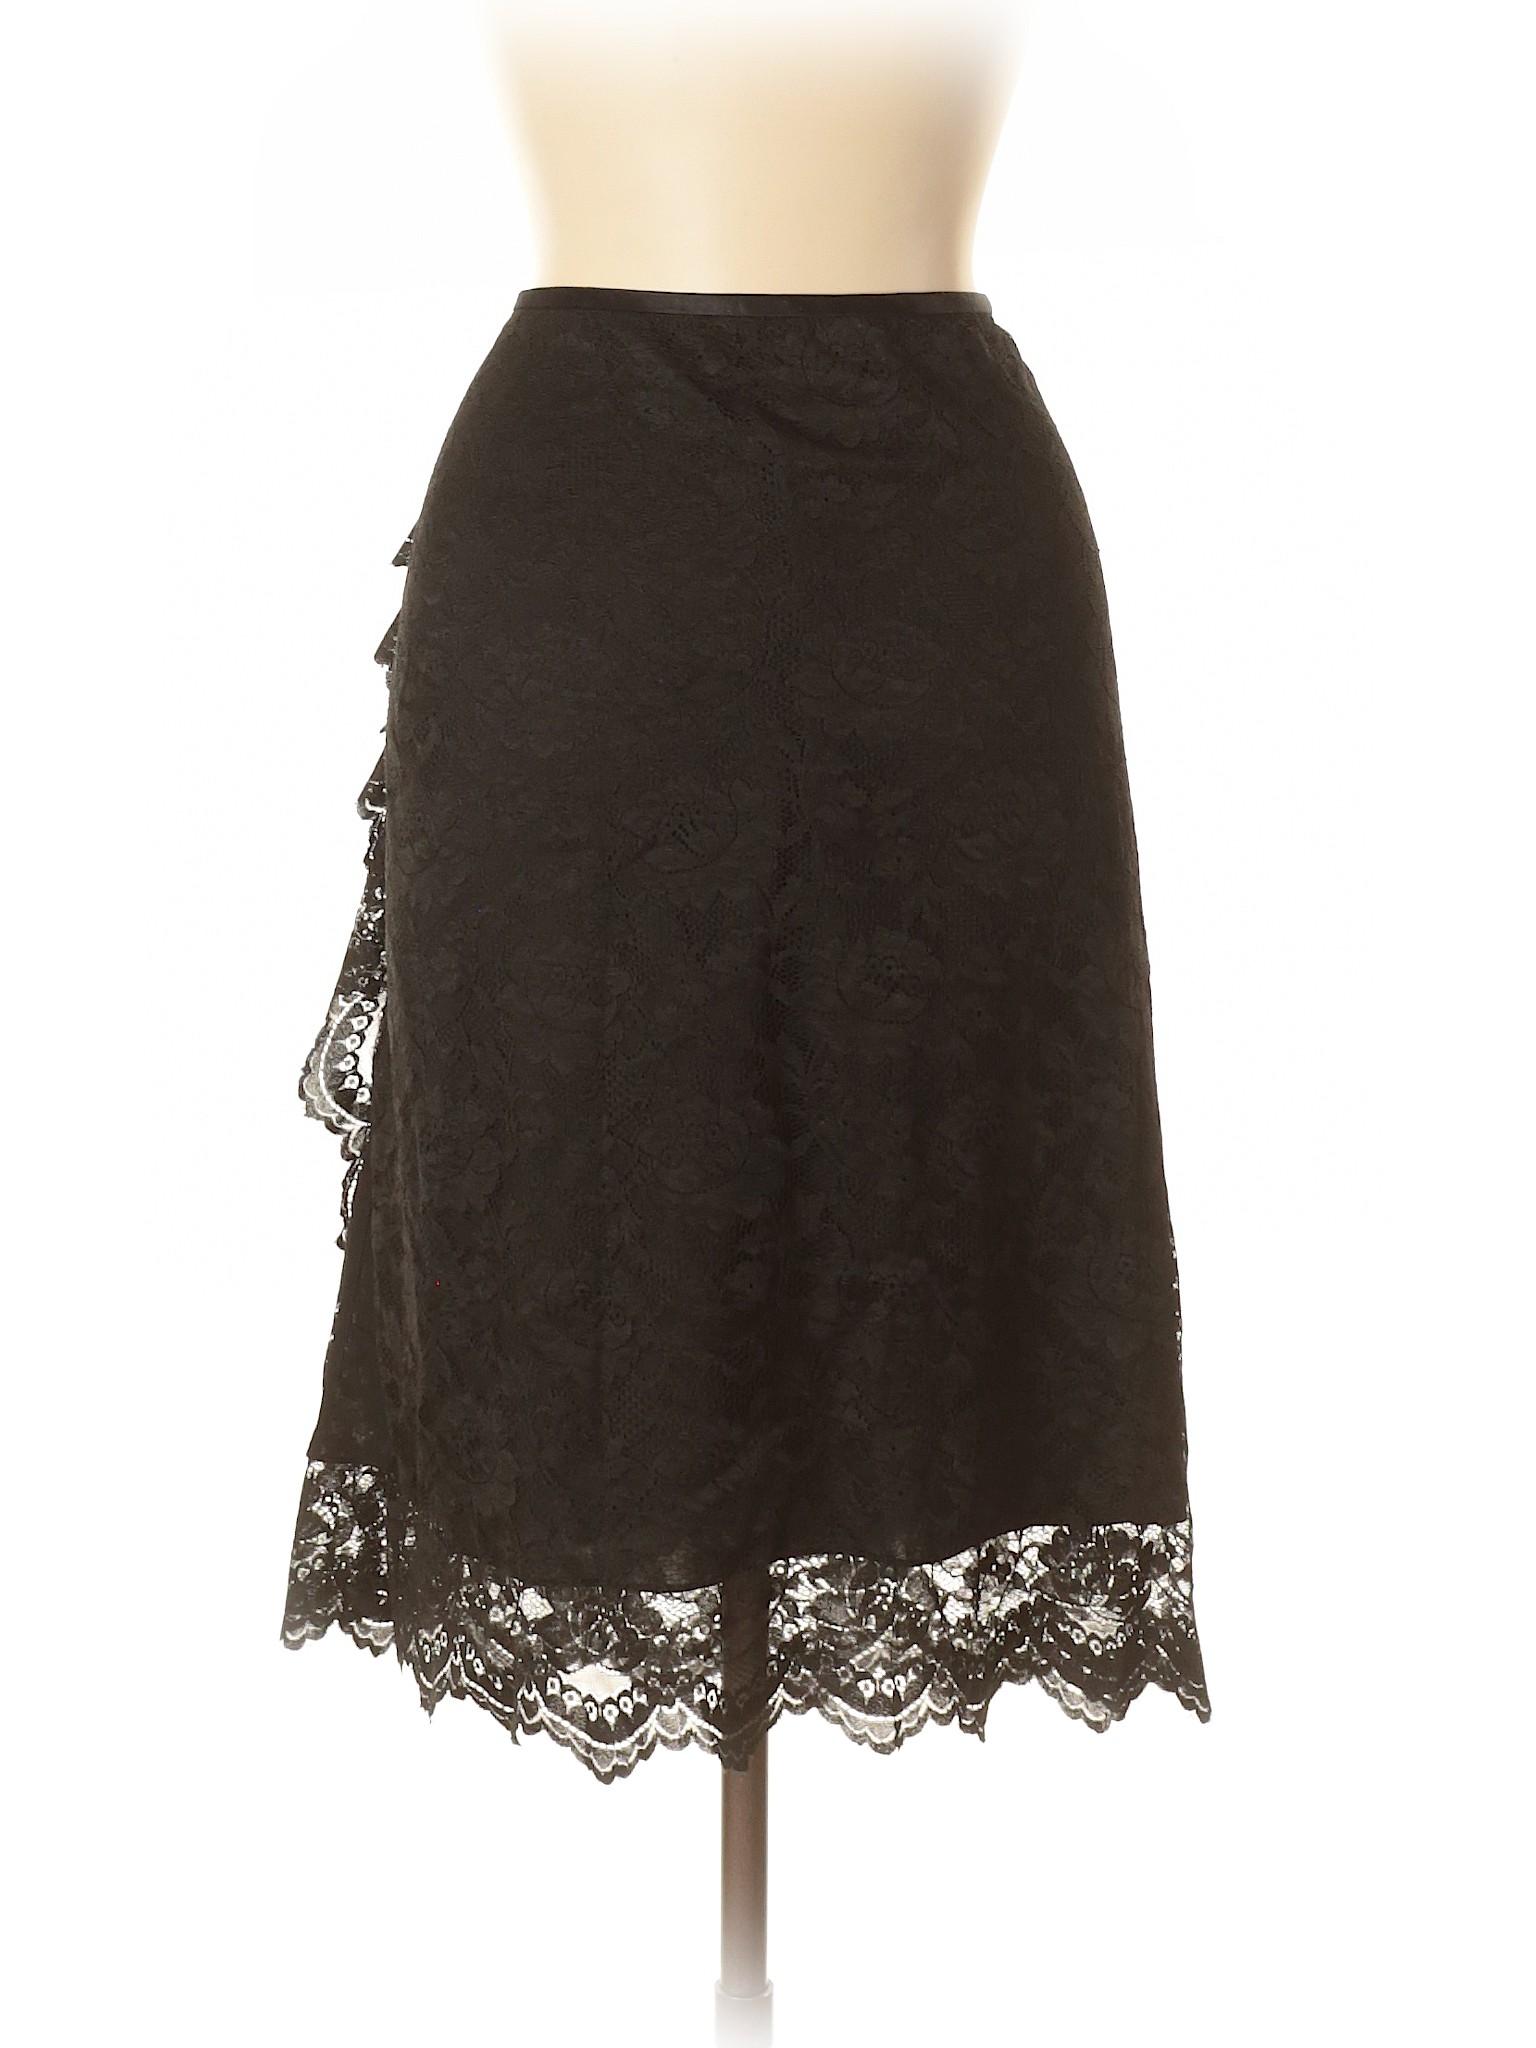 Boutique Skirt Casual Skirt Skirt Casual Skirt Boutique Boutique Casual Boutique Casual axqqdXCw